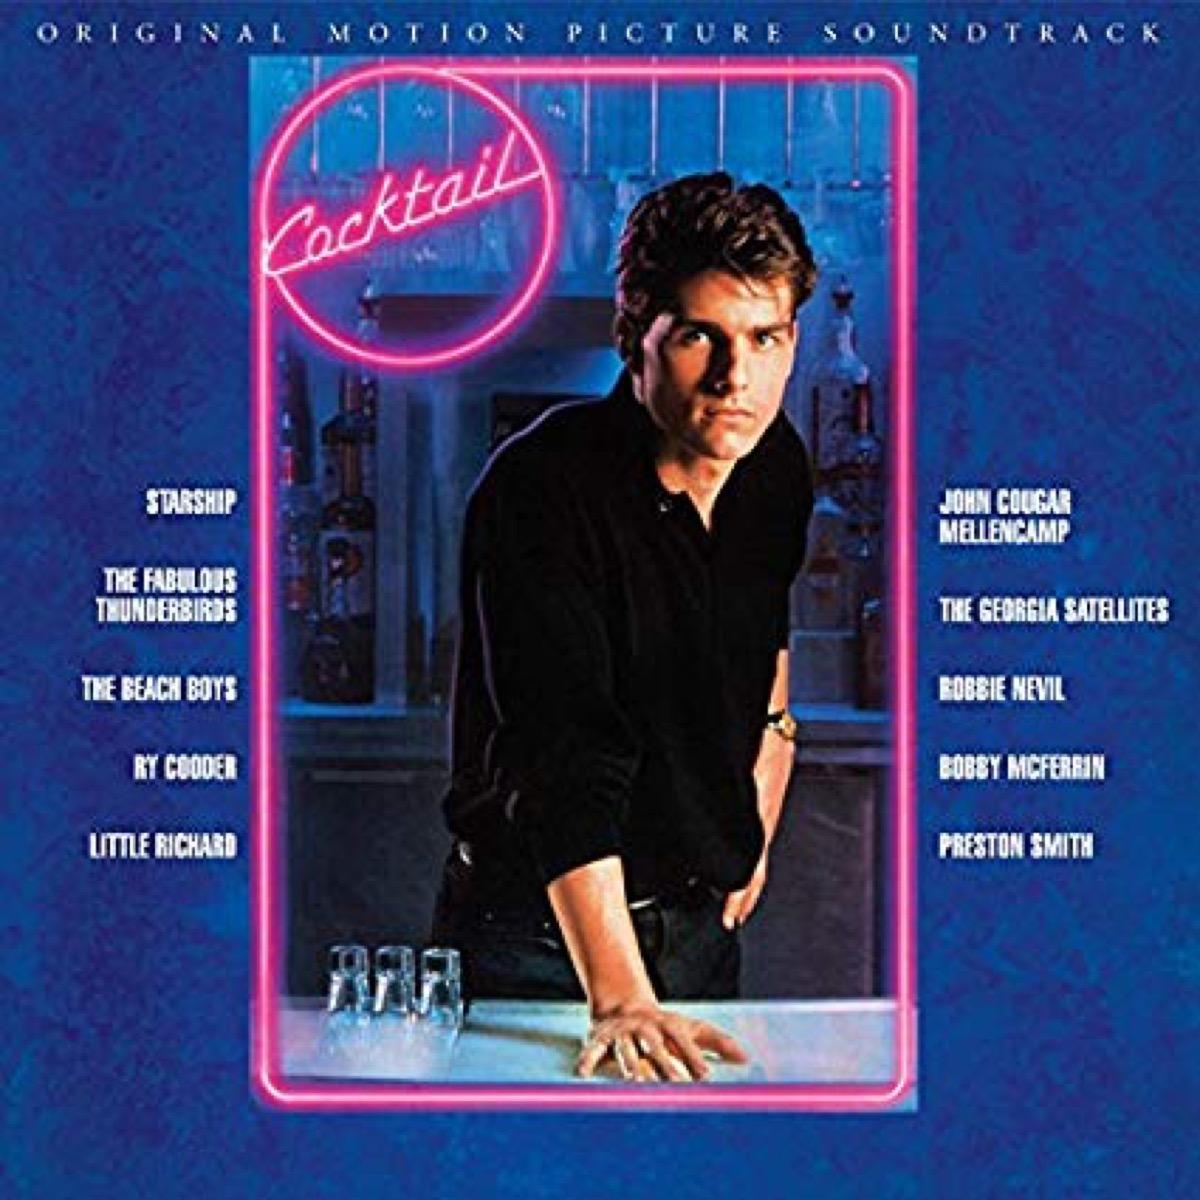 cocktail movie soundtrack album cover